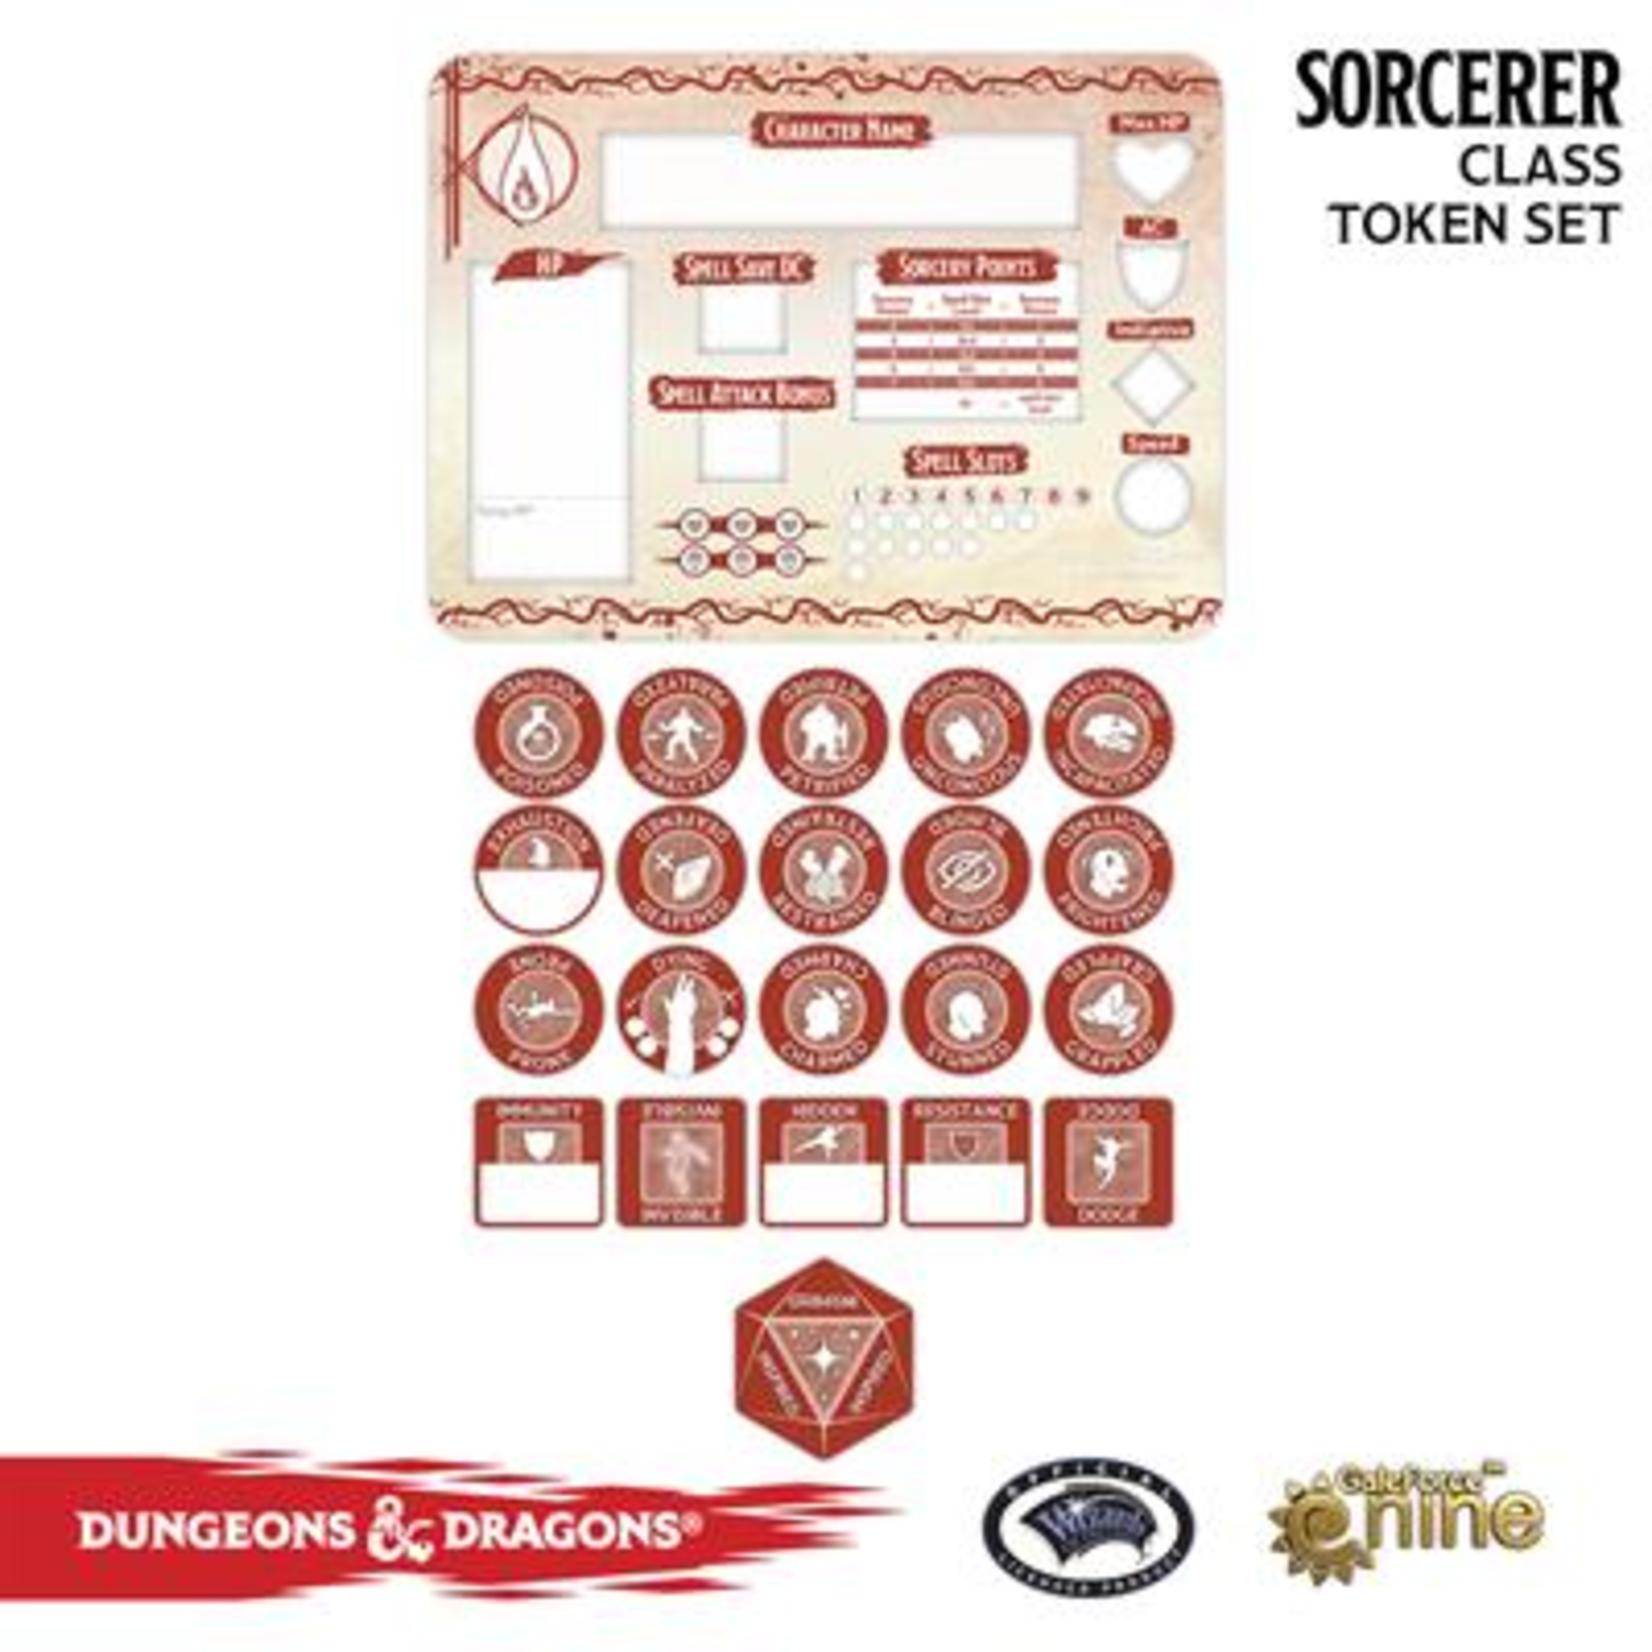 Gale Force Nine Dungeons & Dragons 5th Edition Token Set & Player Board: Sorcerer